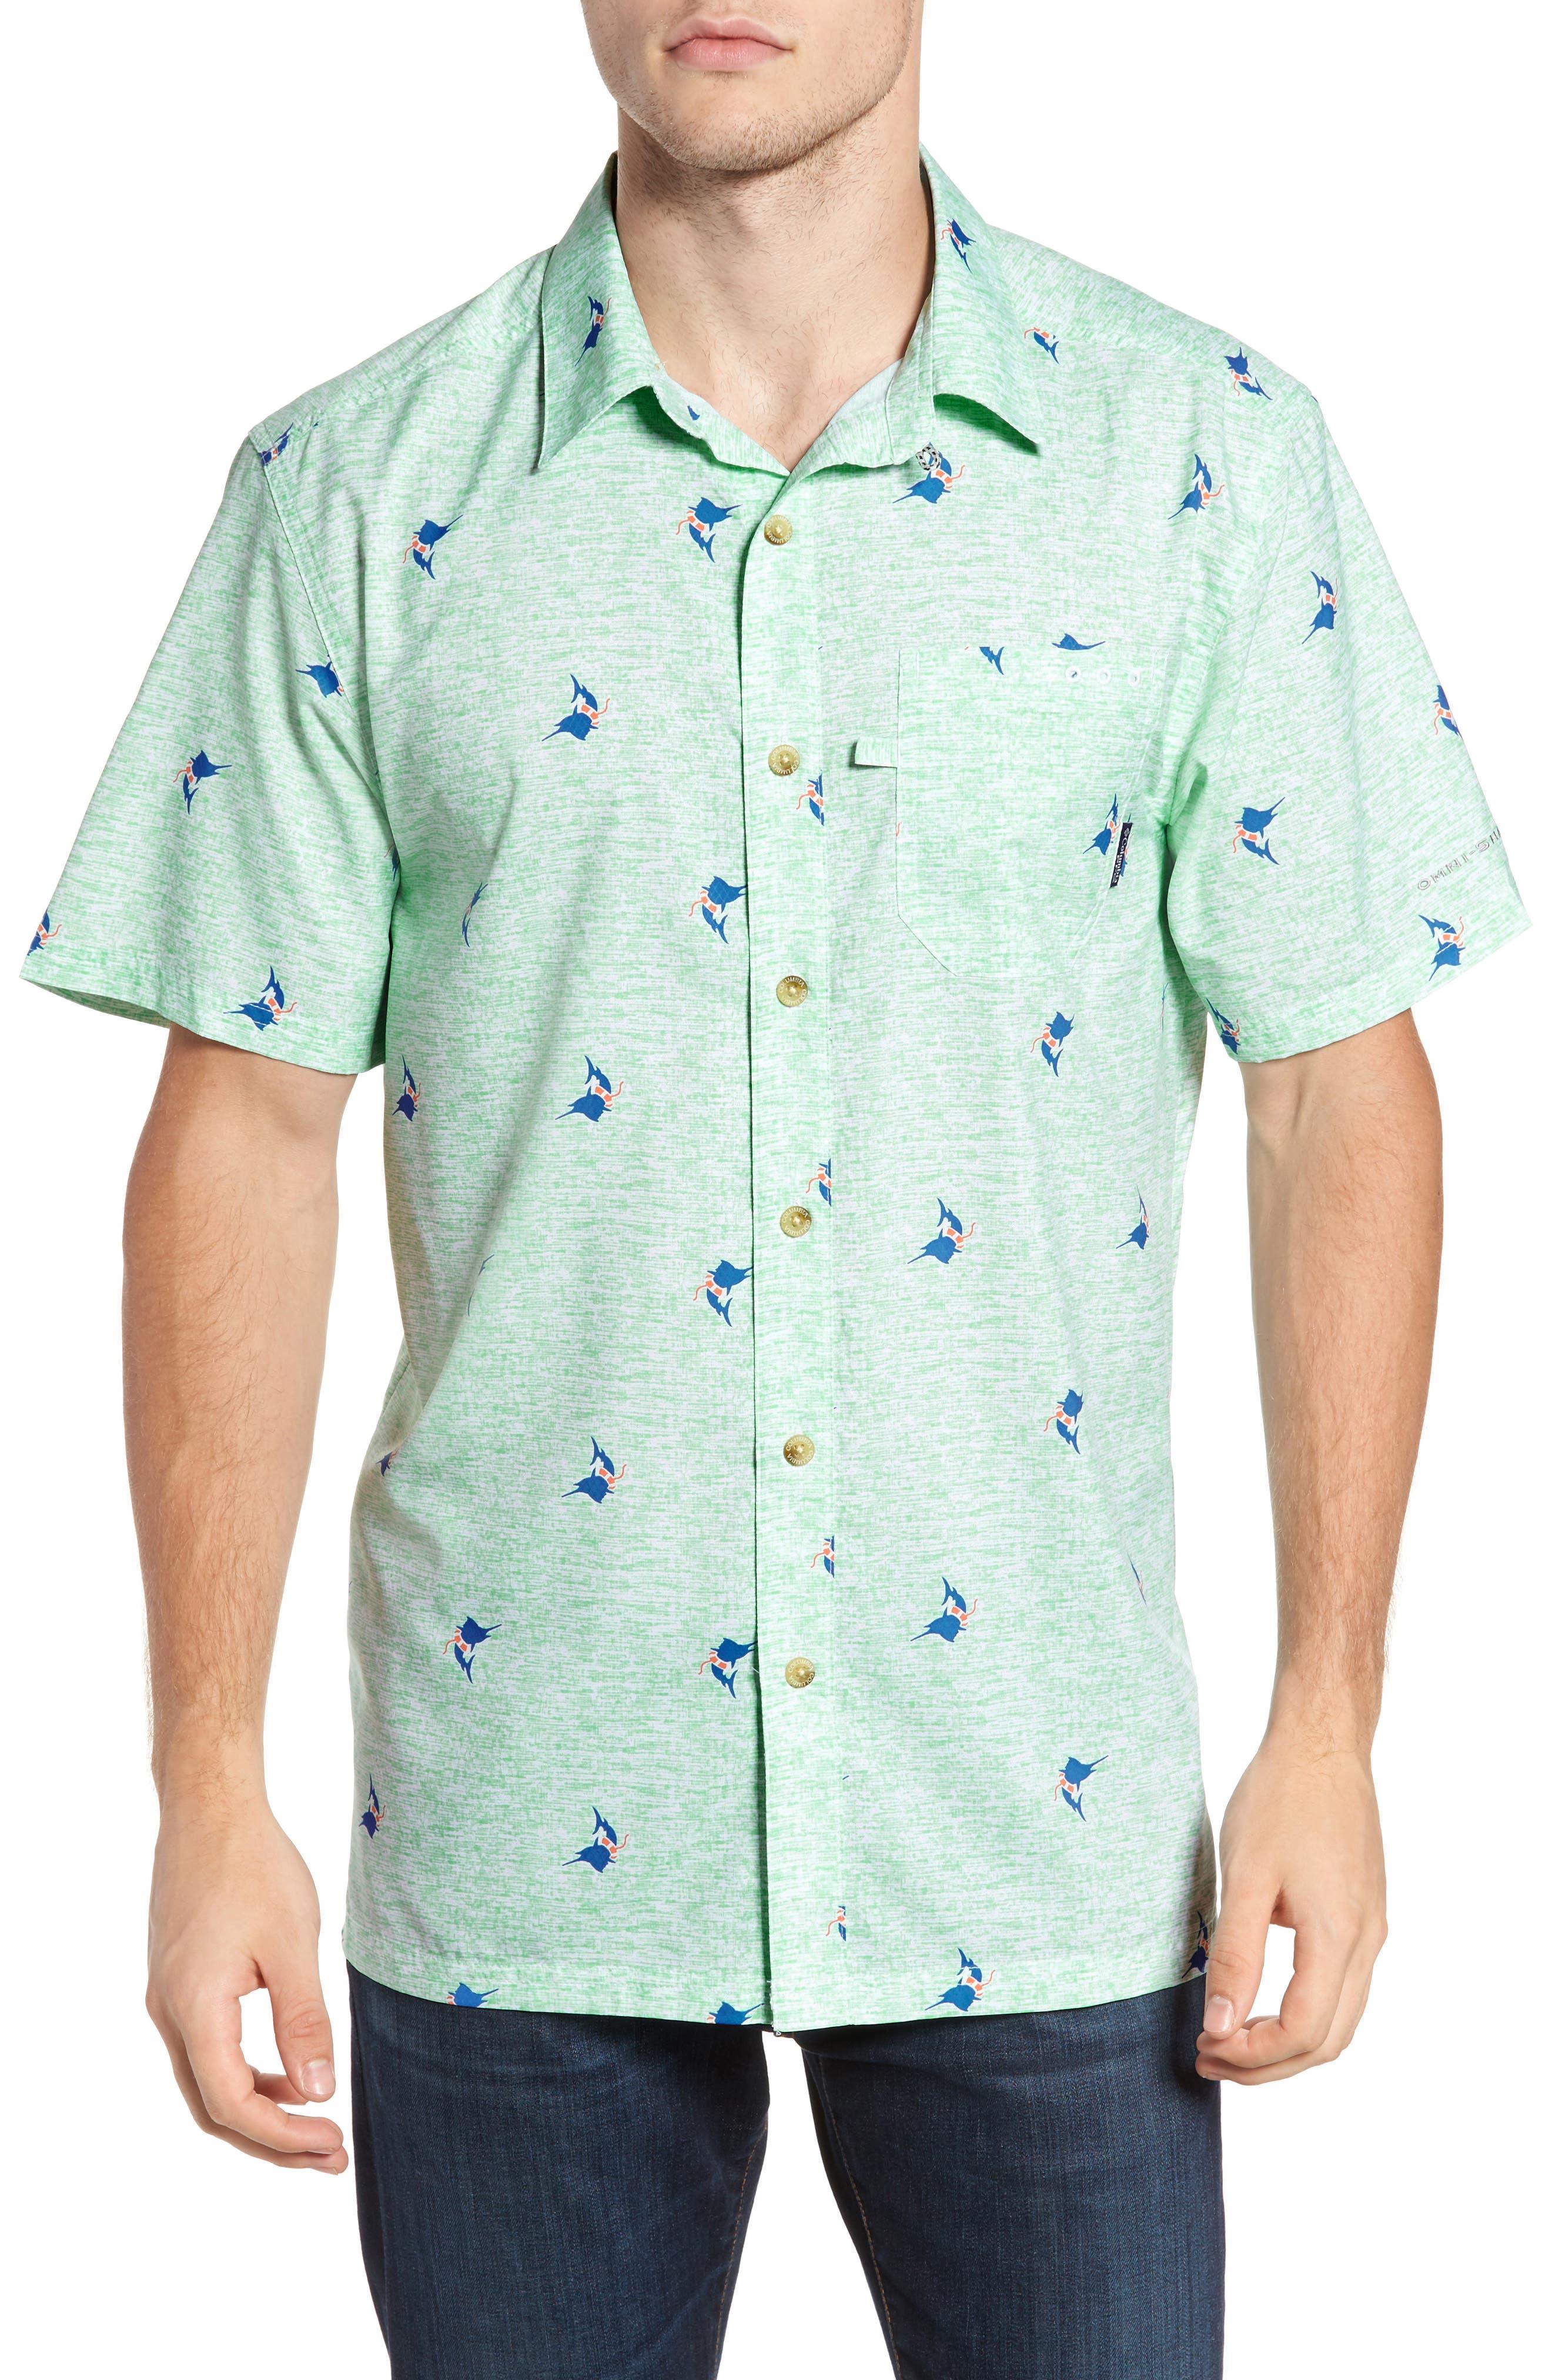 Super Slack Tide Patterned Woven Shirt,                             Main thumbnail 1, color,                             Kelp Marlin Print